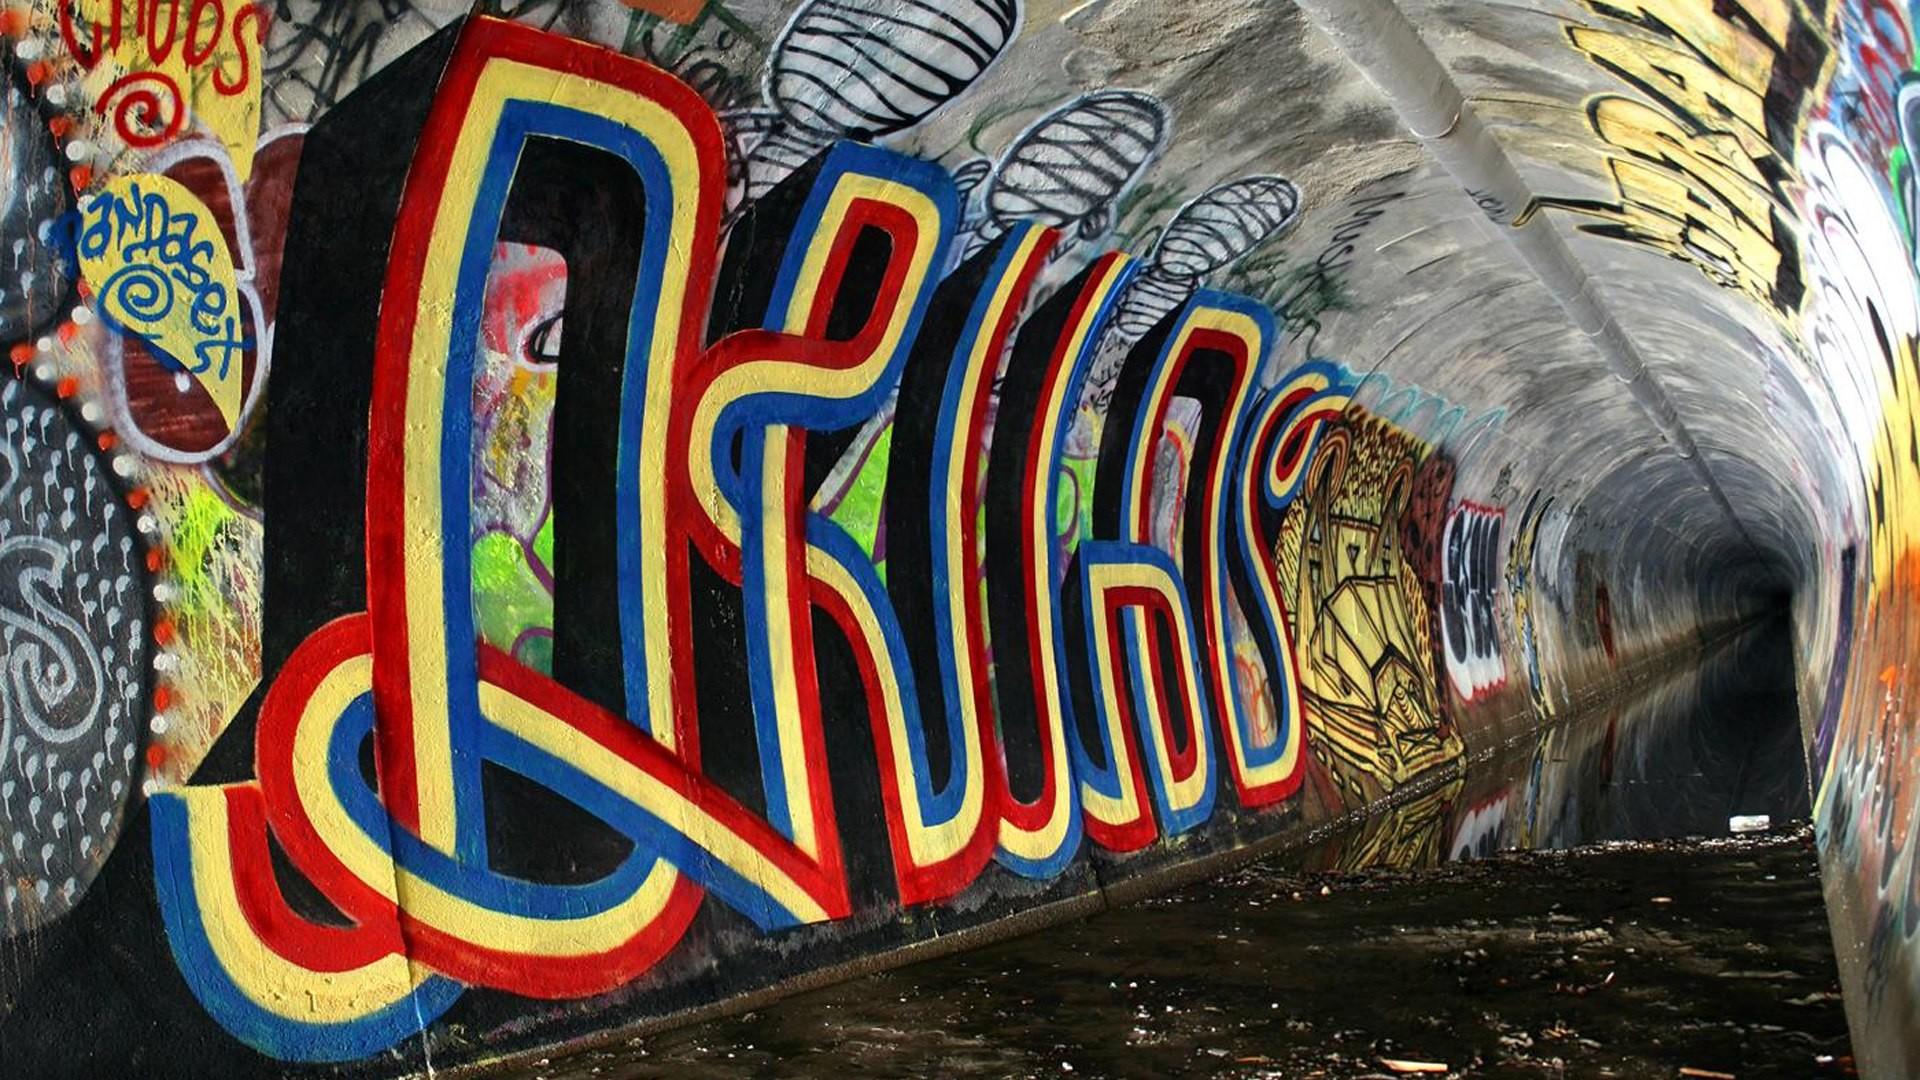 1920x1080 Graffiti Art Beautiful Cool Wallpaper HD Part Of